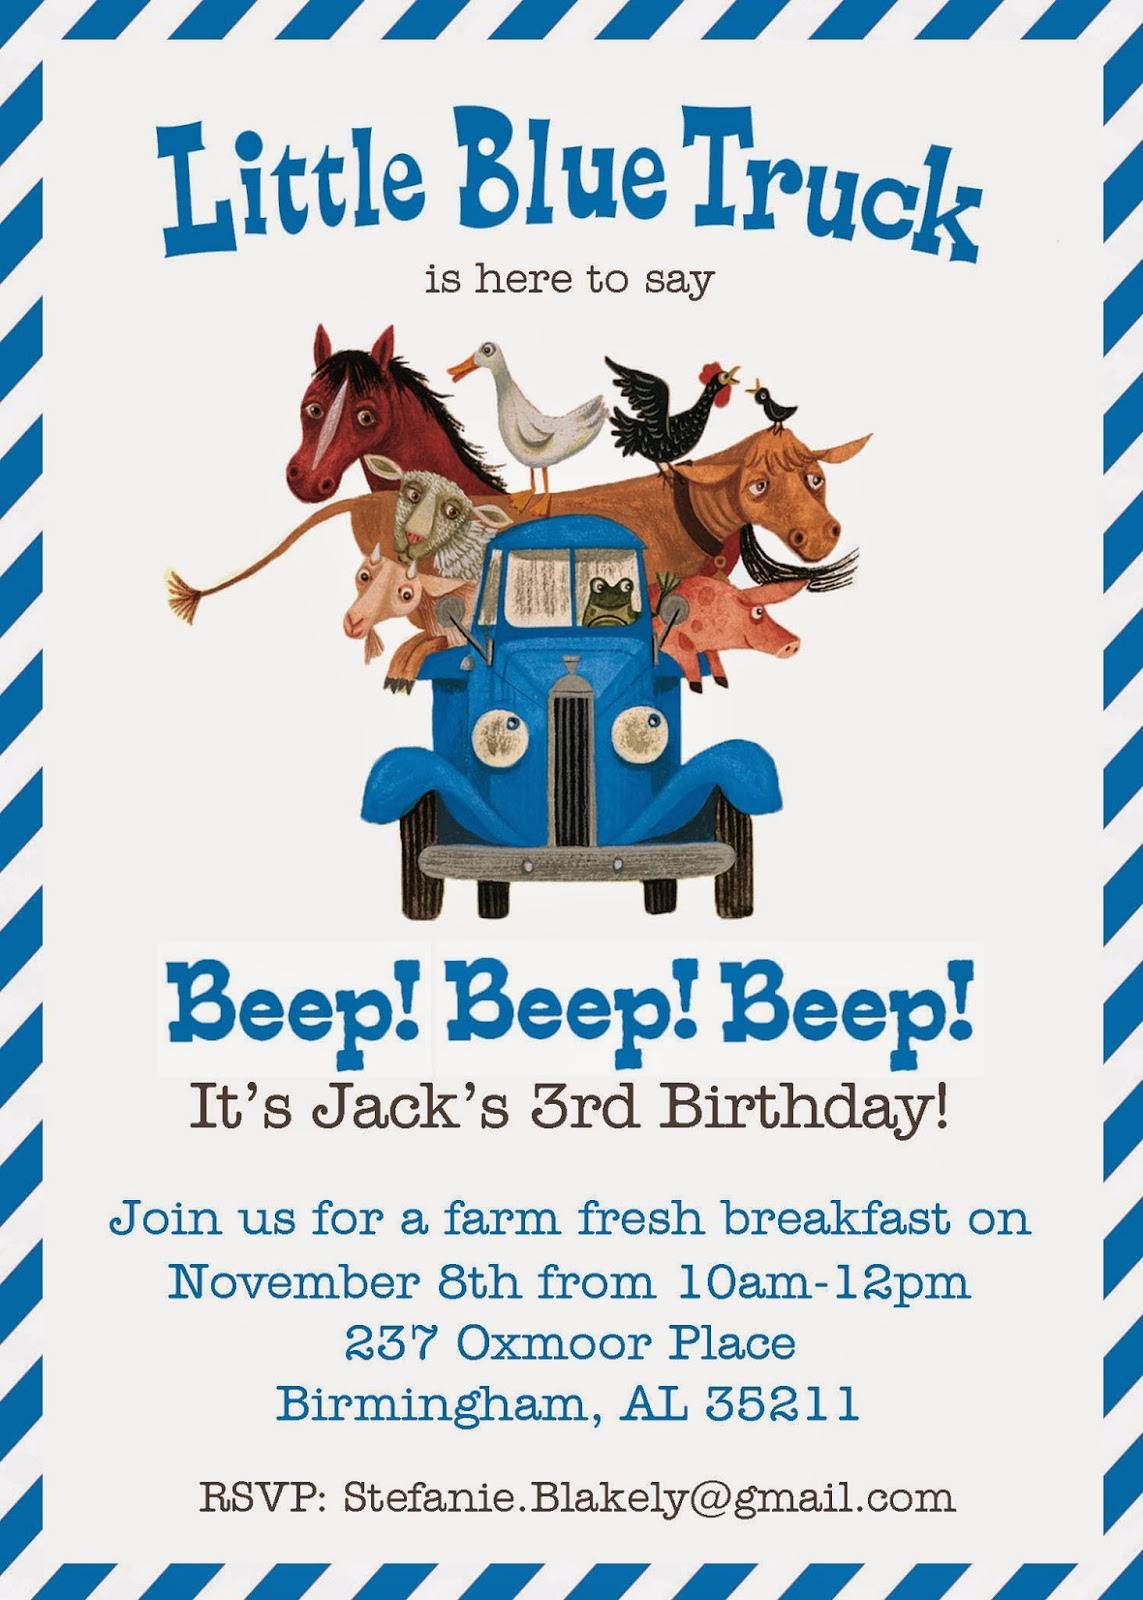 Baby blakely 2014 jacks 3rd birthday we read little blue truck filmwisefo